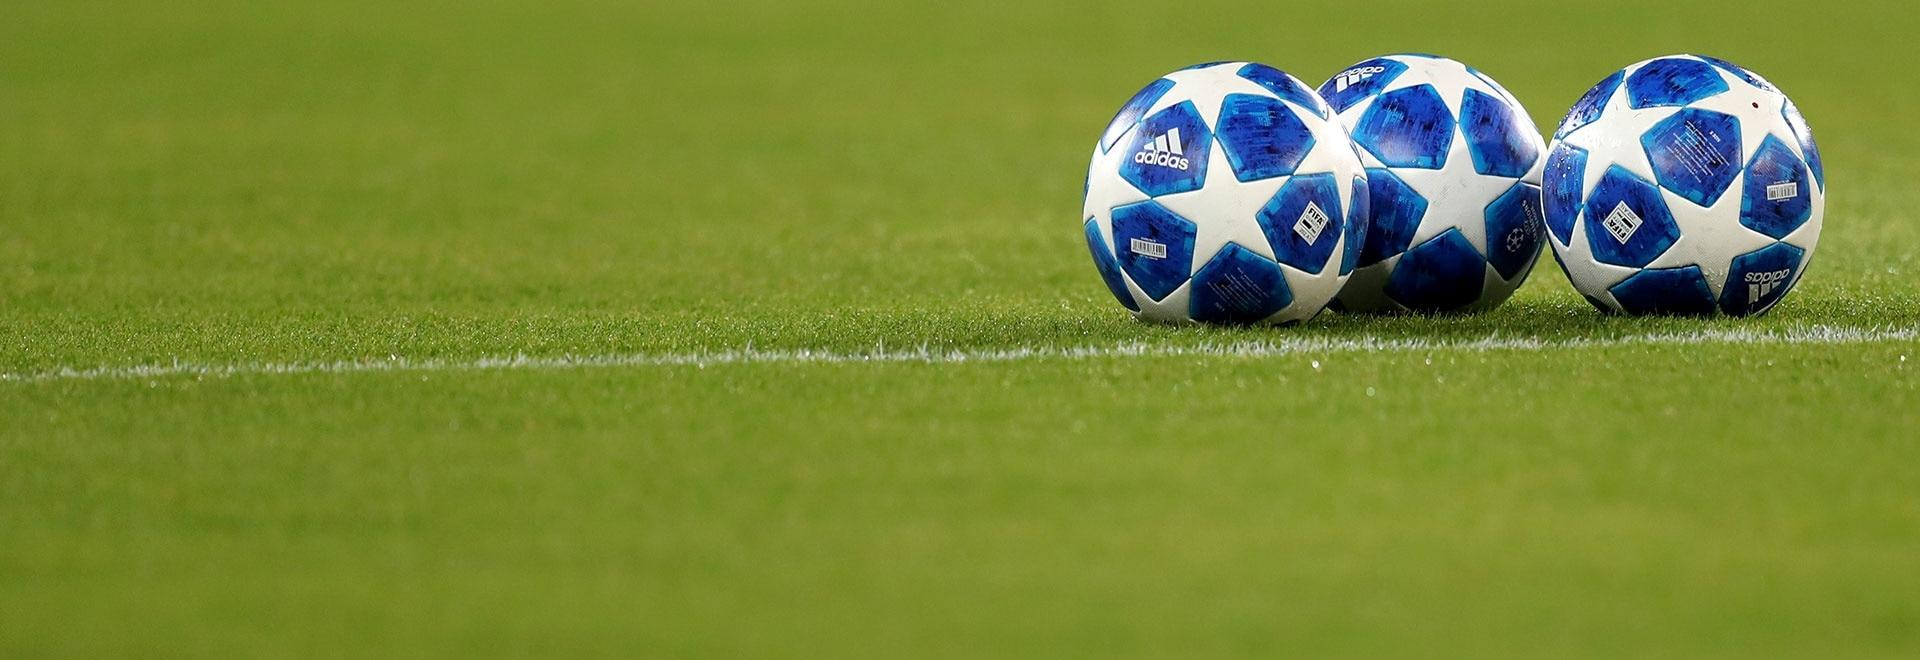 Bayern M. - Chelsea 2012